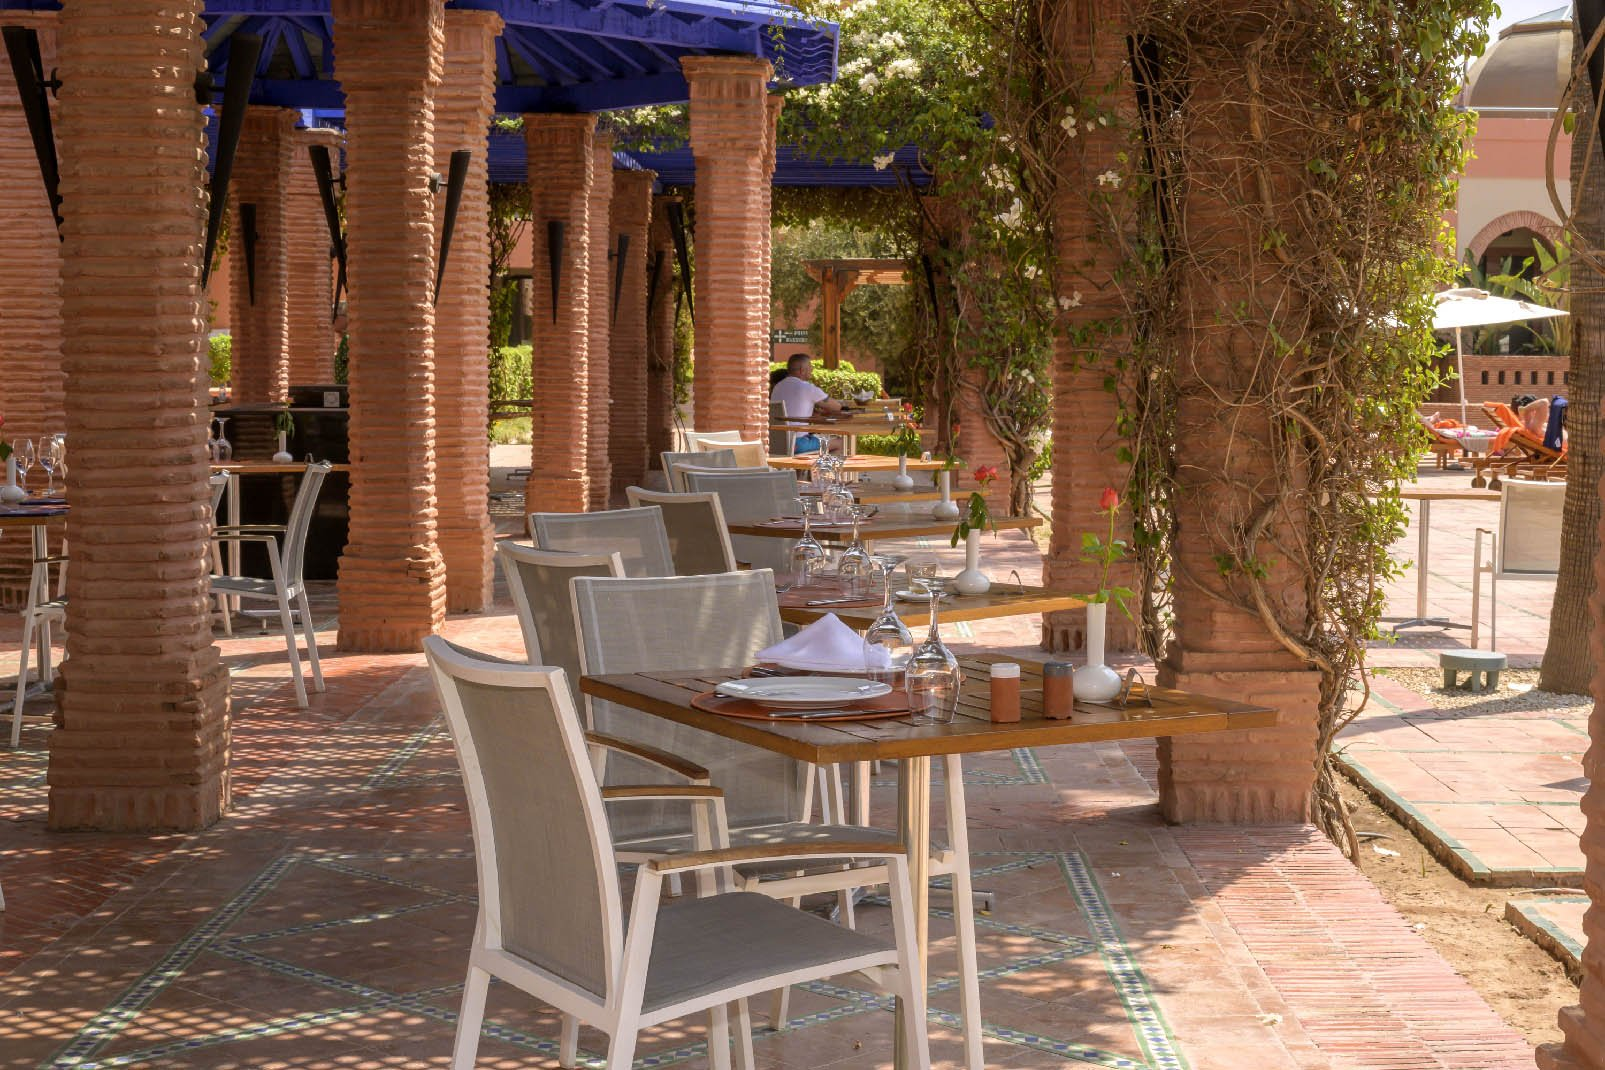 Jardin Majorelle Marrakech Génial Thb Les Jardins De L Agdal Hotel & Spa In Marrakech Of 85 Beau Jardin Majorelle Marrakech